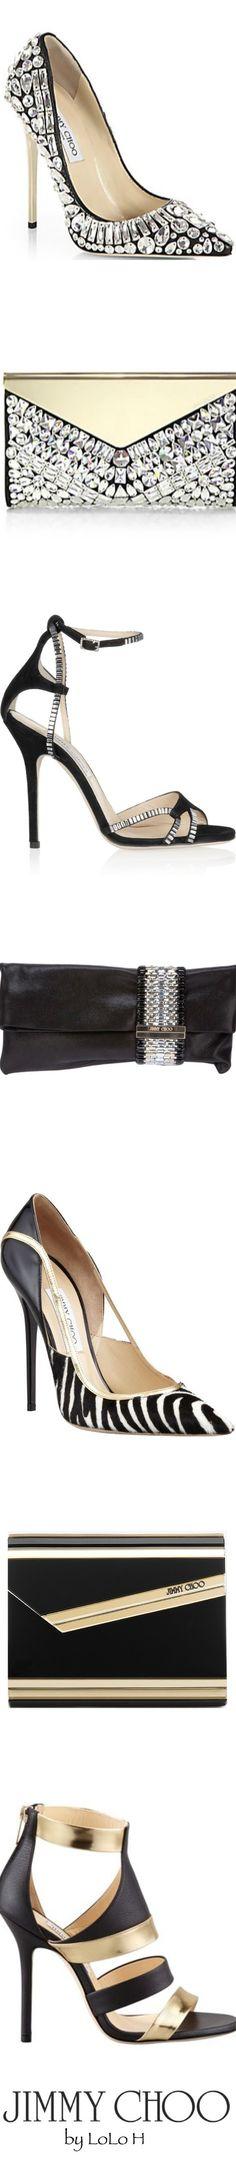 ✦ The Socialites Shoes a peak into Ms. Socialites shoe closet. Please dont drool ✦ Jimmy Choo